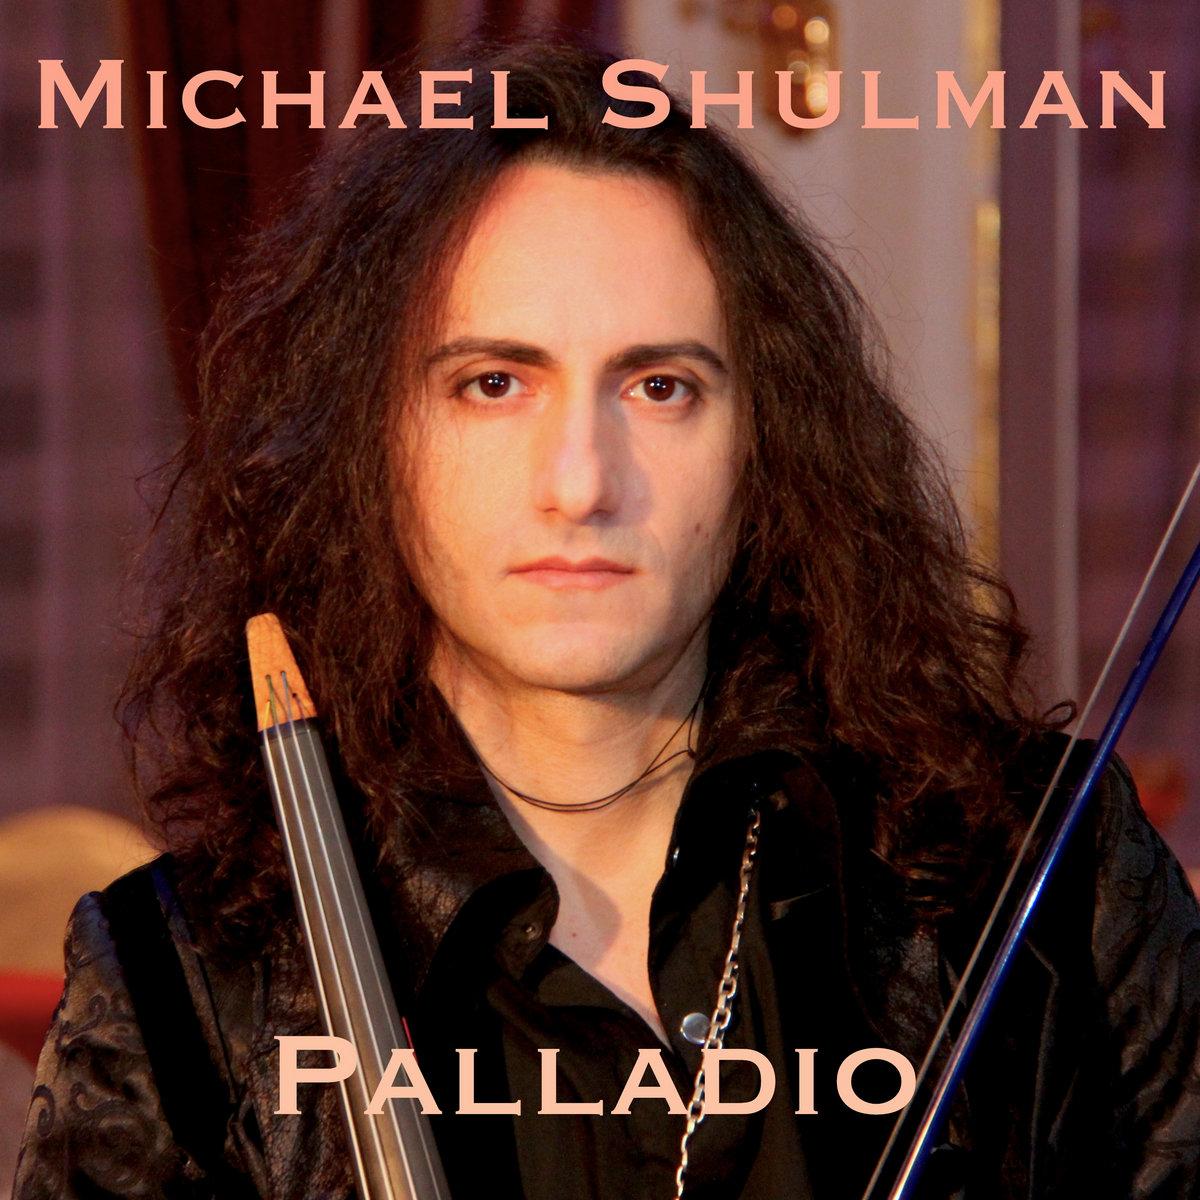 Palladio | Michael Shulman